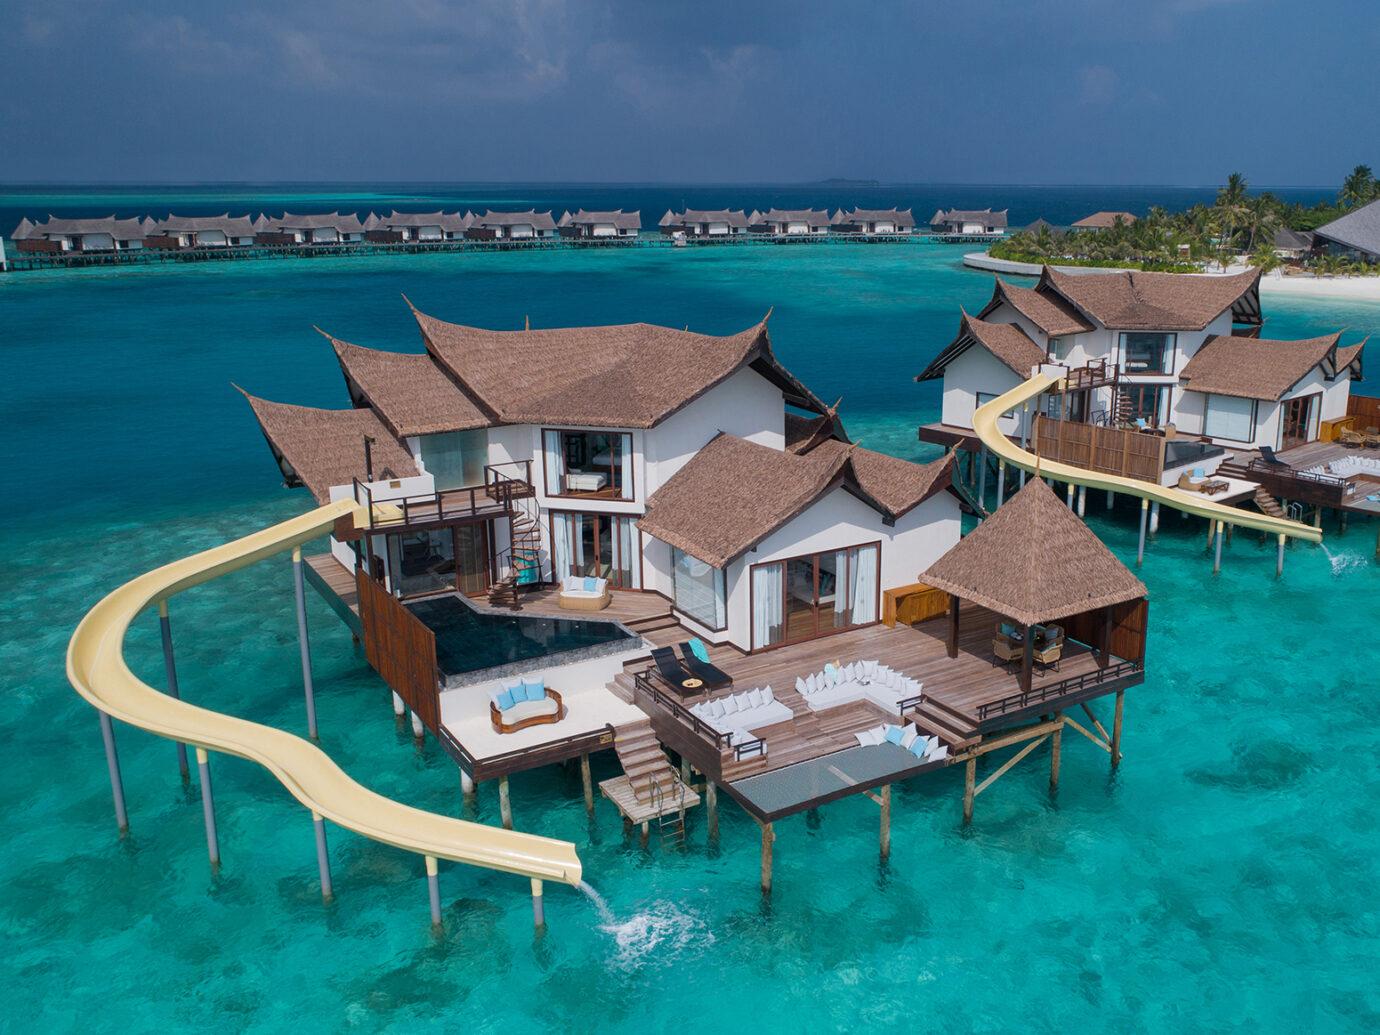 Jumeirah Vittaveli - Private Ocean Retreat with Slide - Aerial View